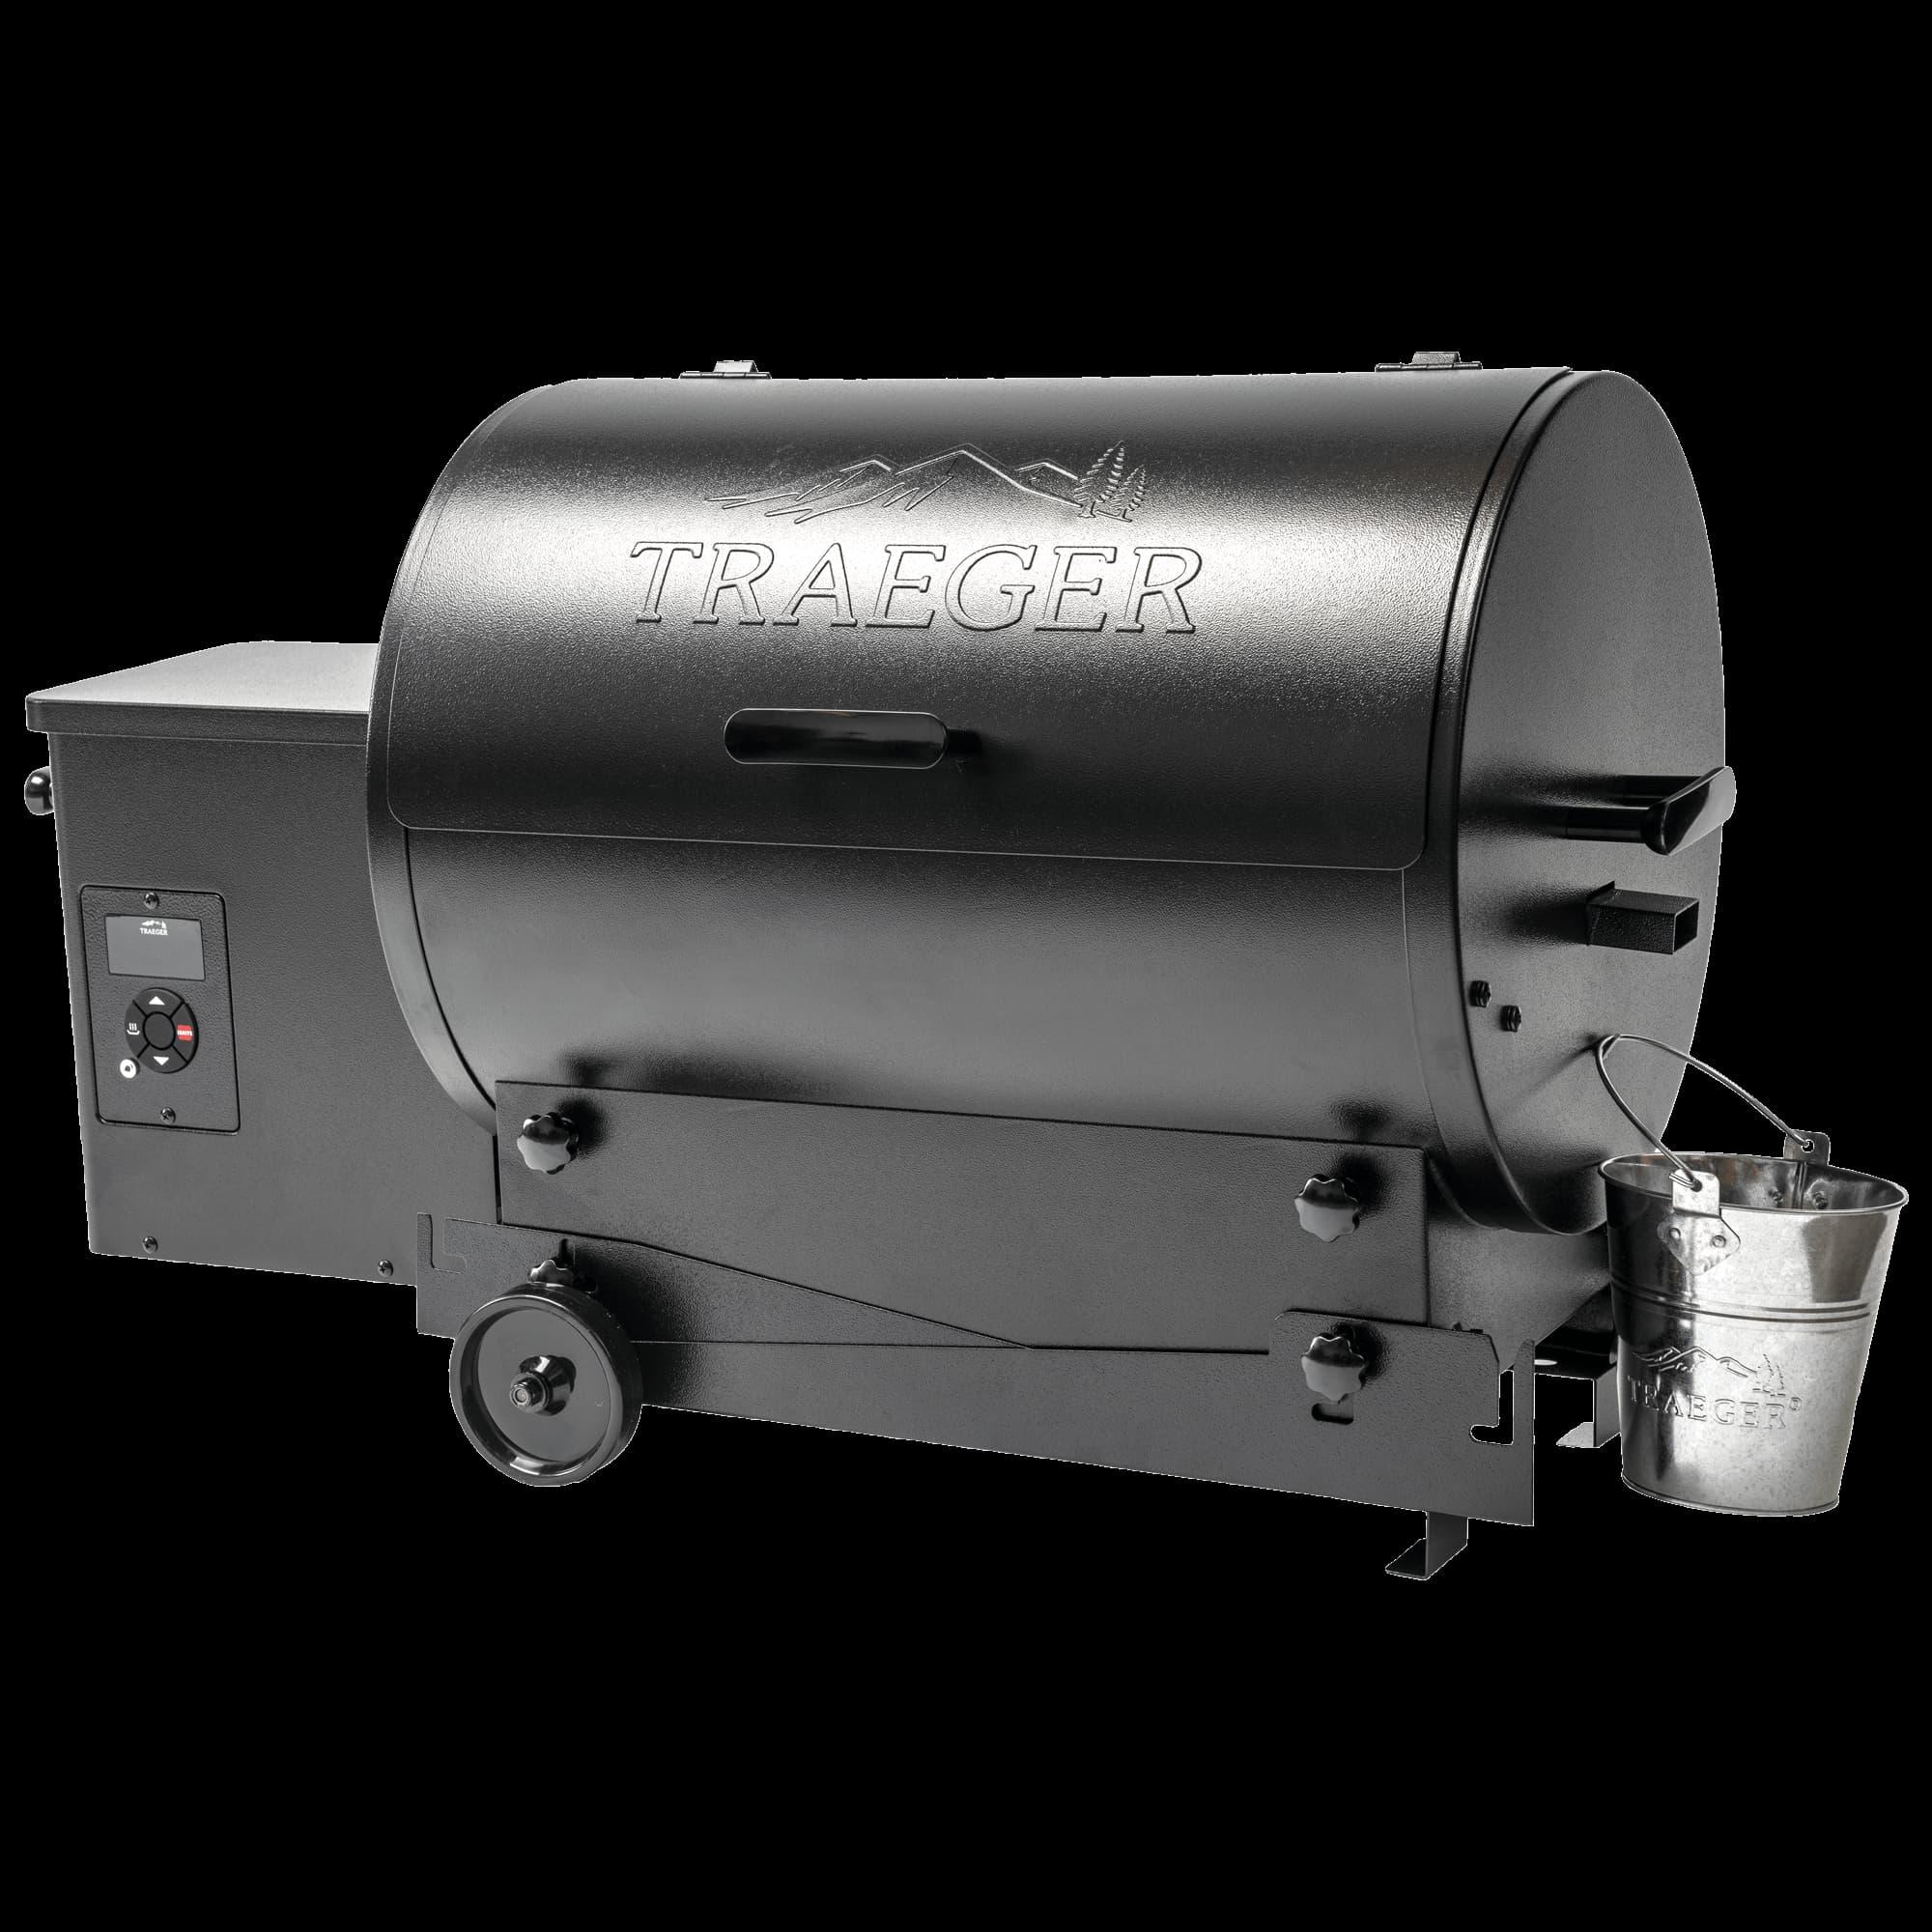 Traeger Tailgater